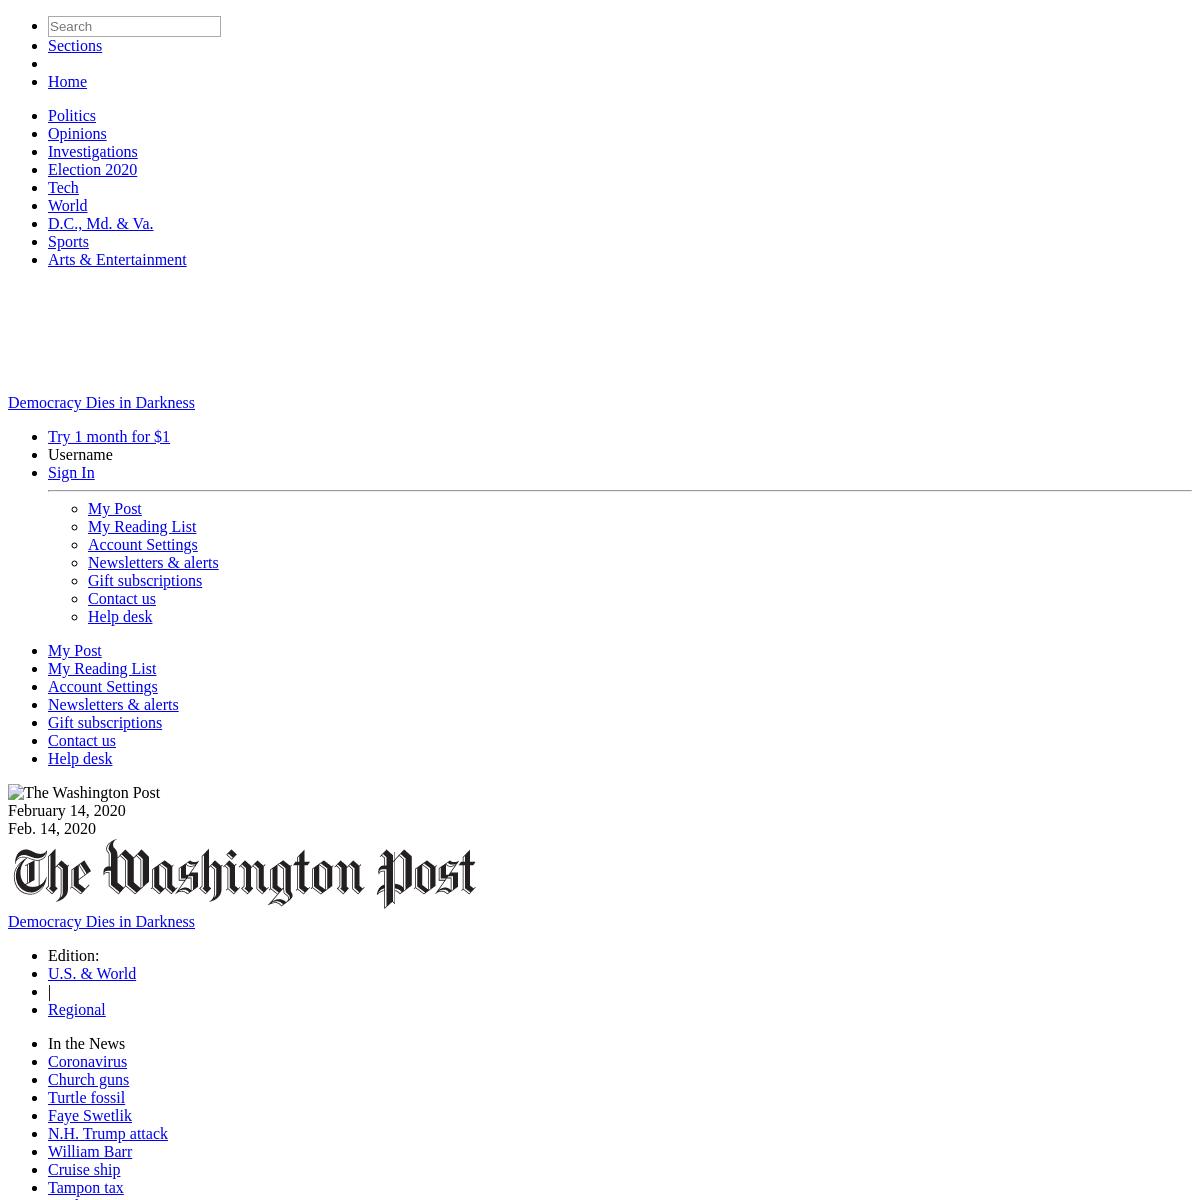 ArchiveBay.com - www.washingtonpost.com/politics/2020/02/13/challenge-joe-bidens-message-black-voters-holding/ - Washington Post- Breaking News, World, US, DC News & Analysis - The Washington Post